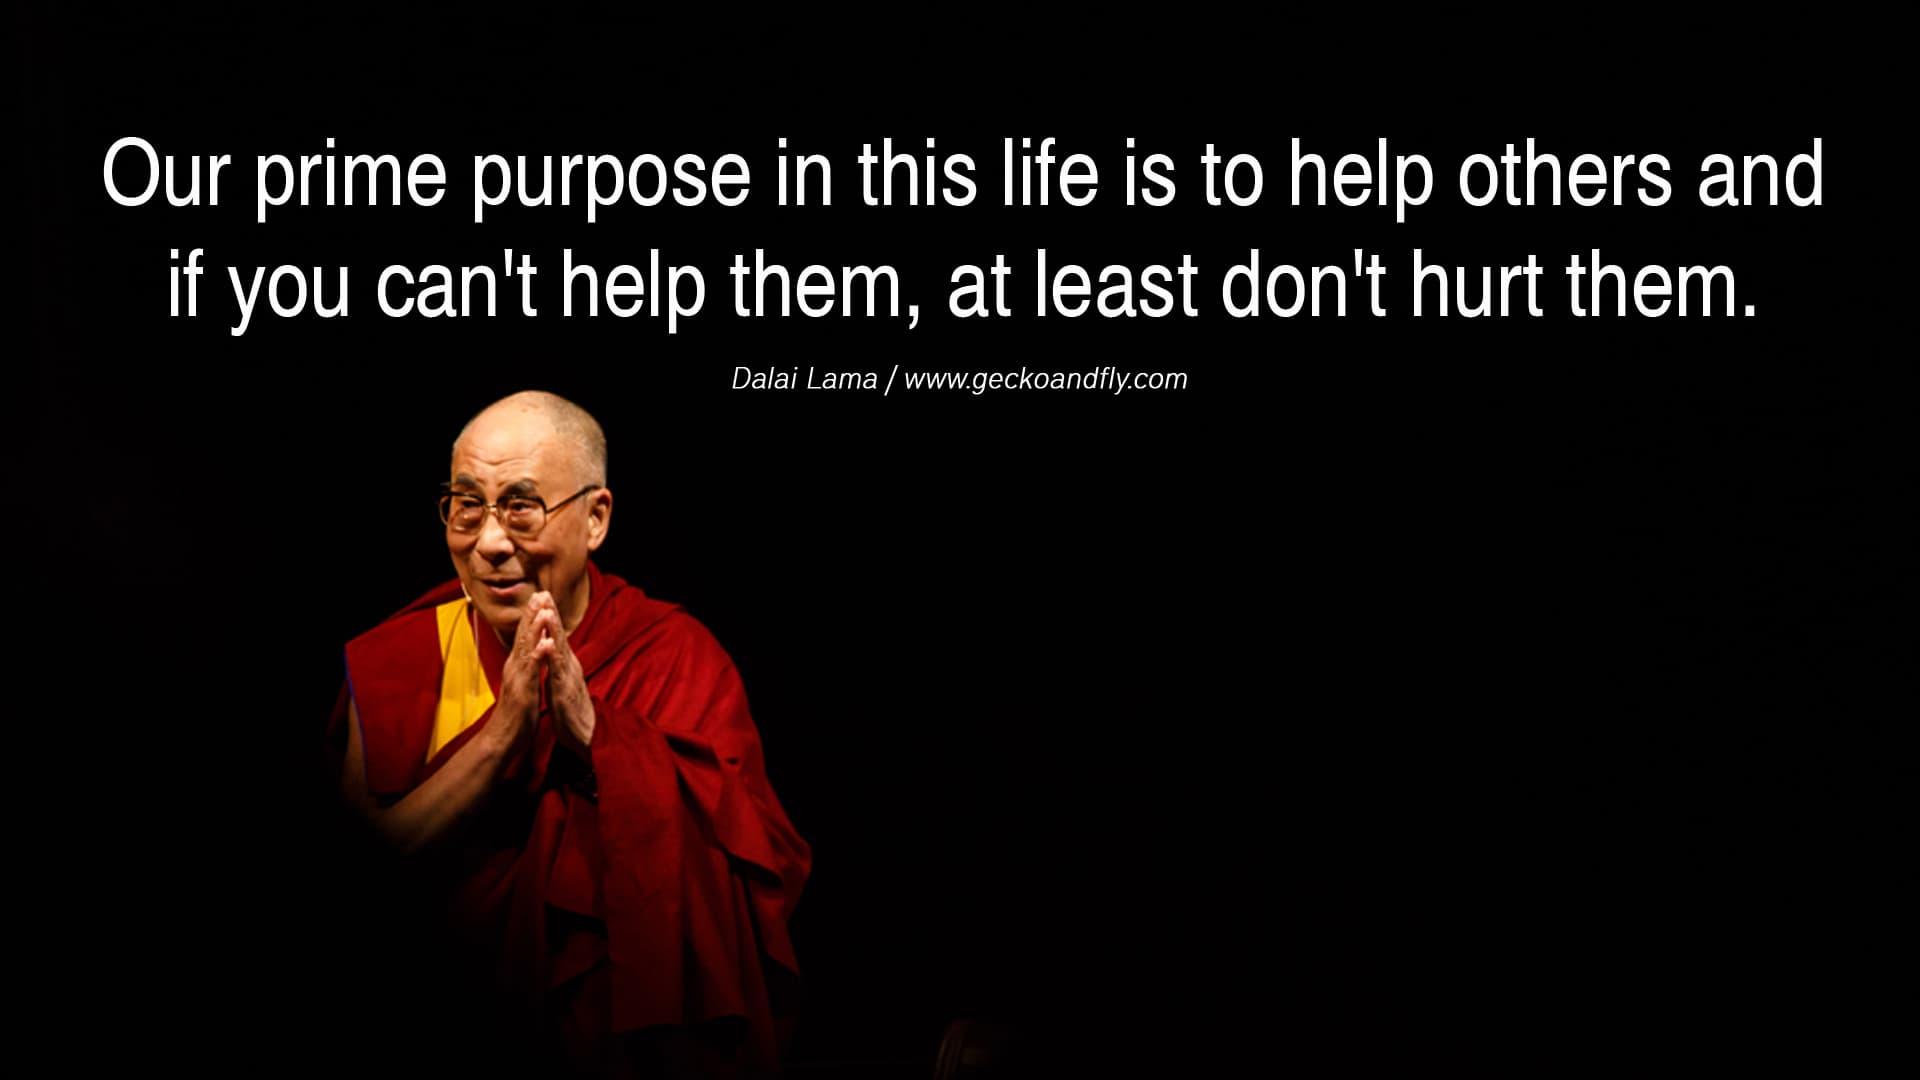 dalai lama quotes 13